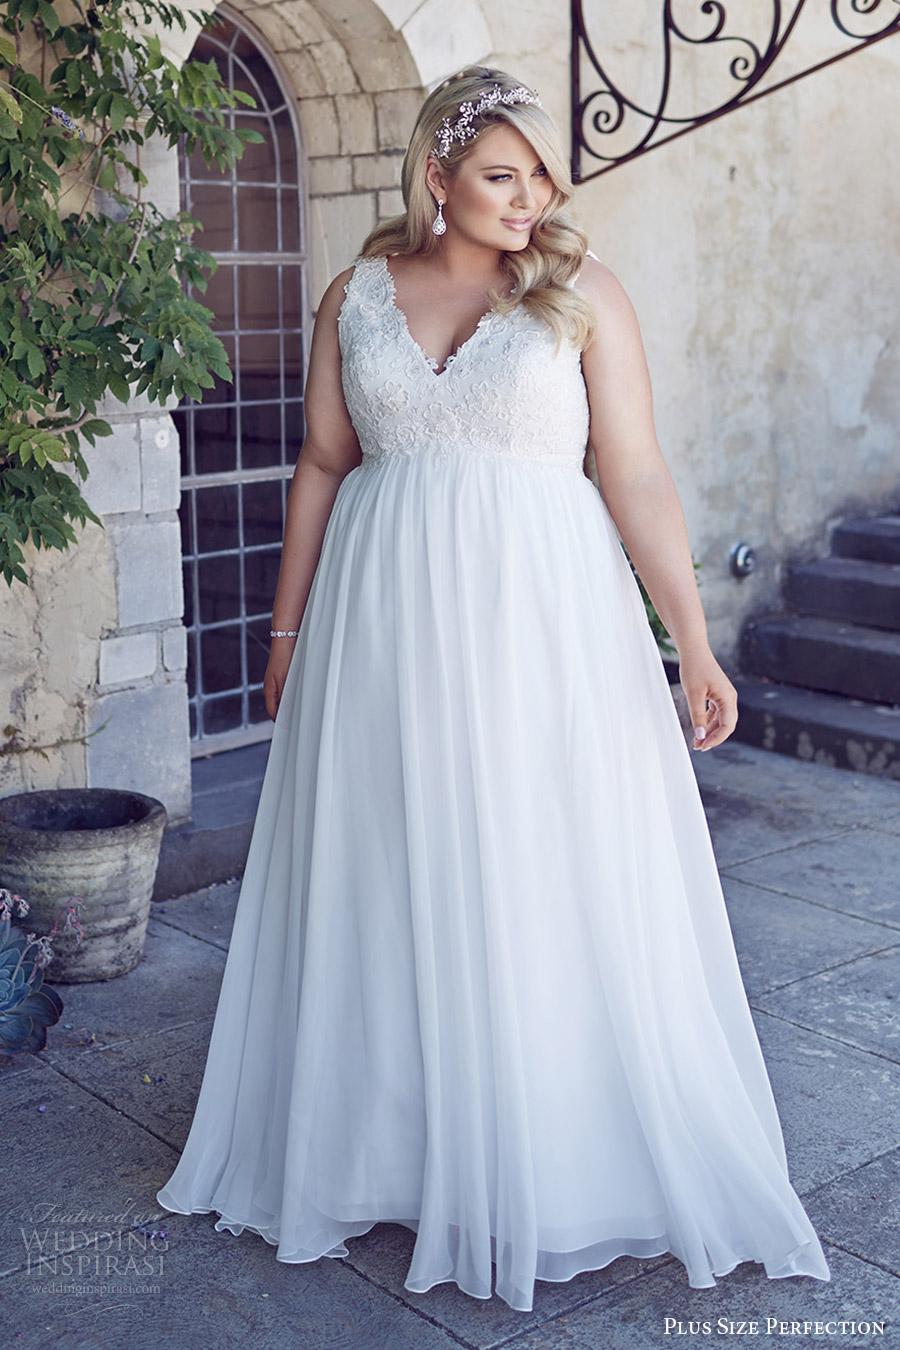 Plus Size Wedding Dress Melbourne